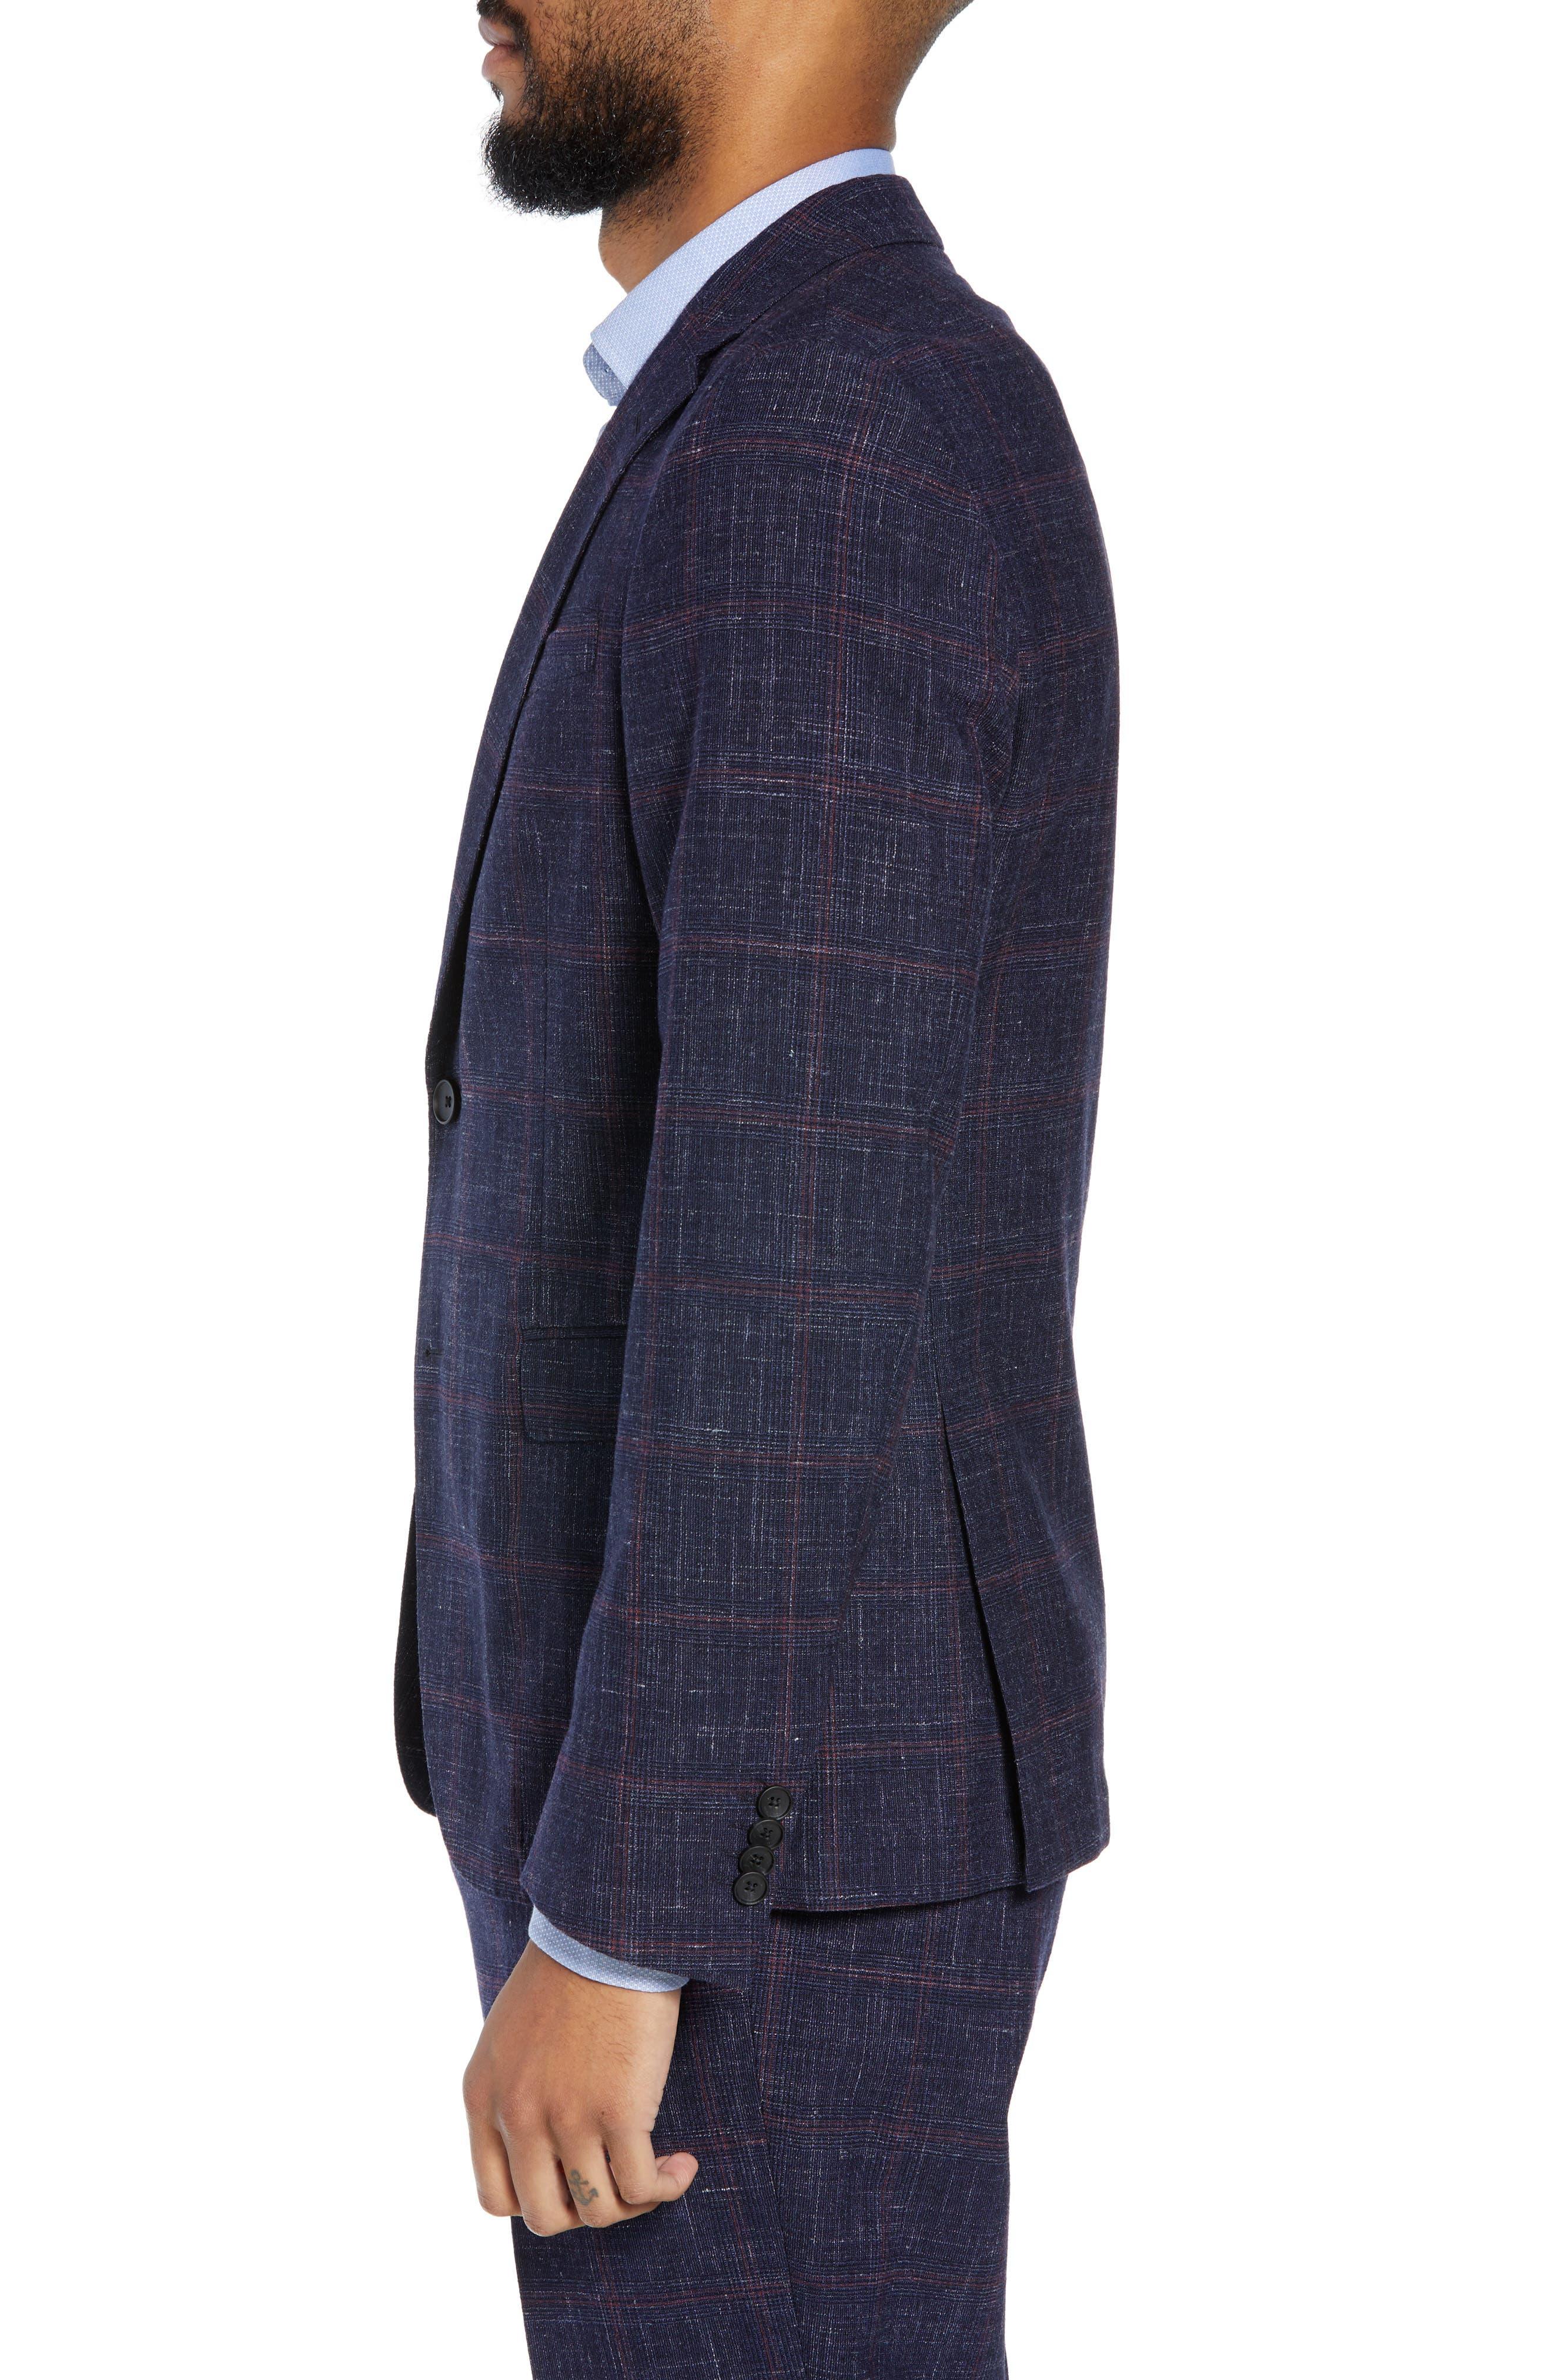 Nobis Trim Fit Plaid Wool Blend Sport Coat,                             Alternate thumbnail 3, color,                             DARK BLUE